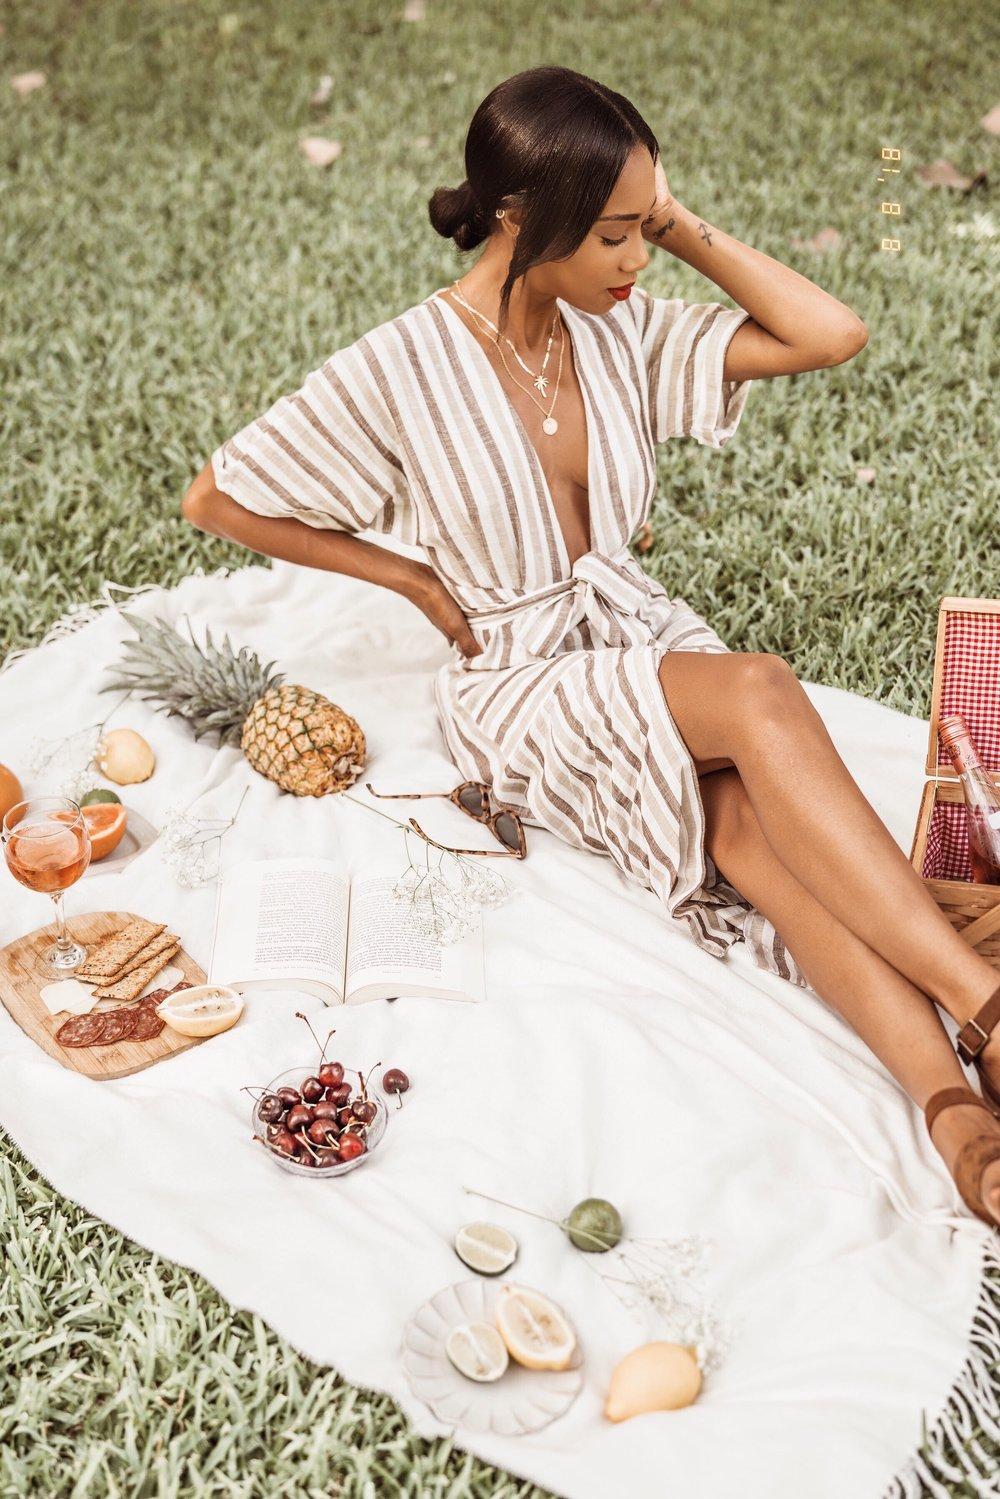 picnic3.jpg